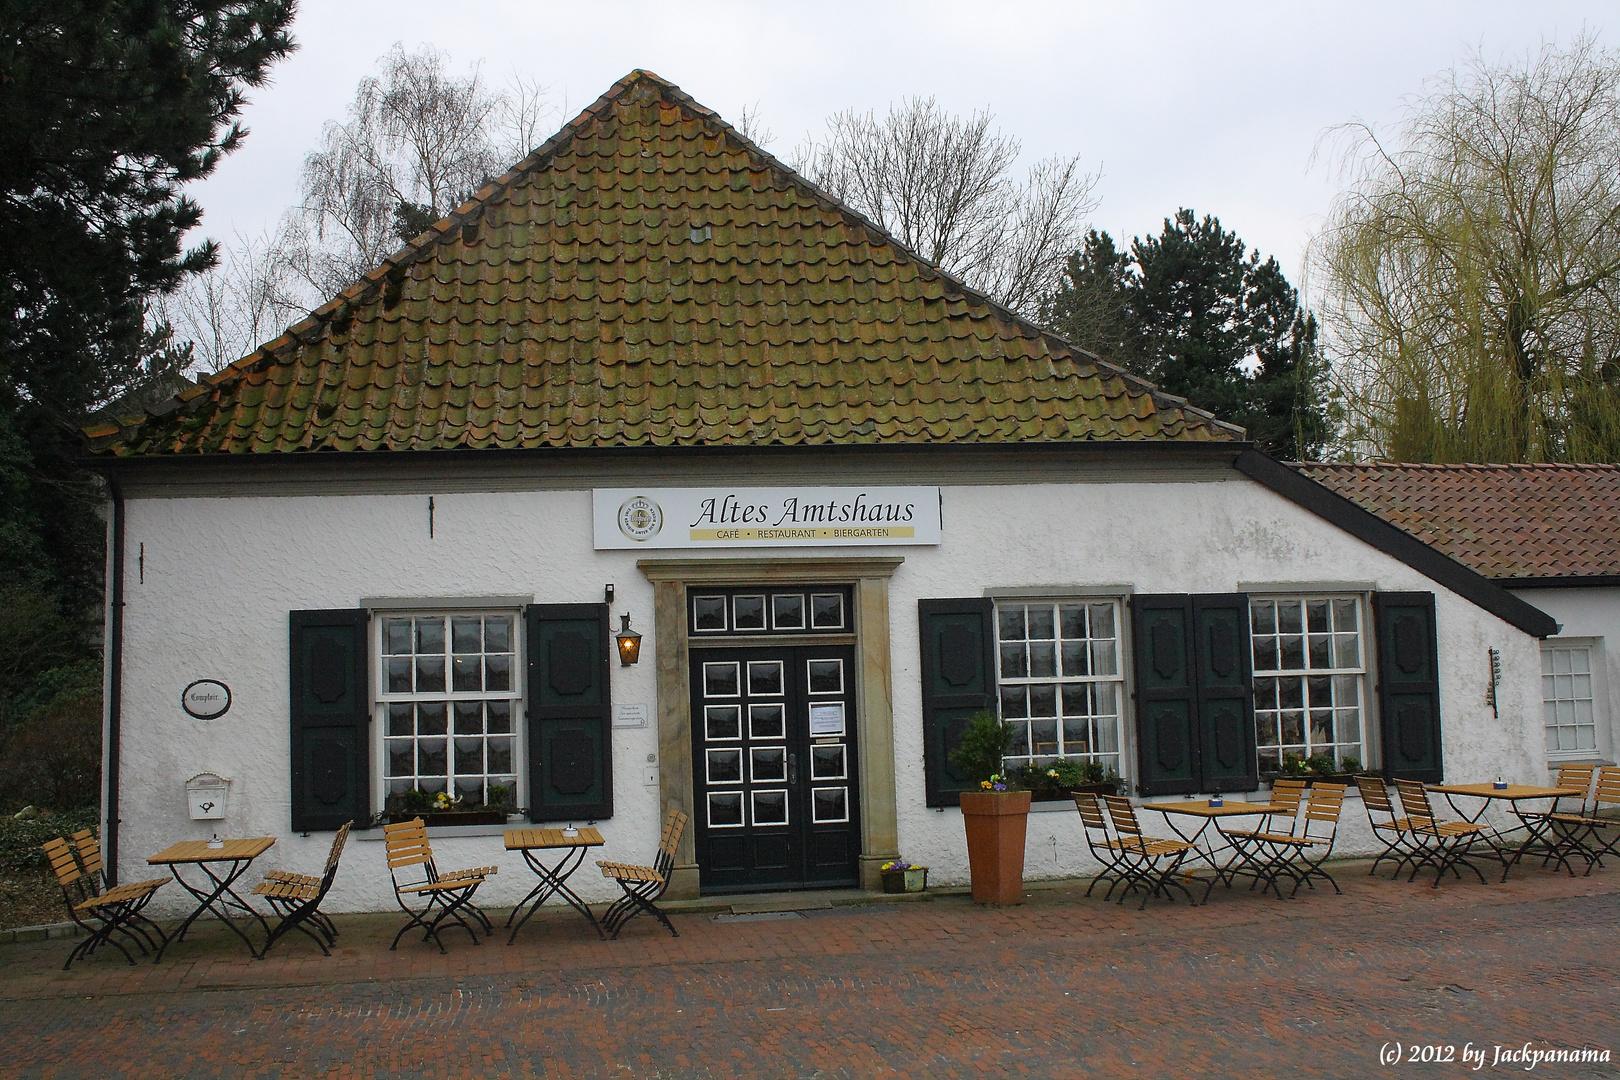 Altes Amtshaus - Café - Museum - Biergarten in Papenburg